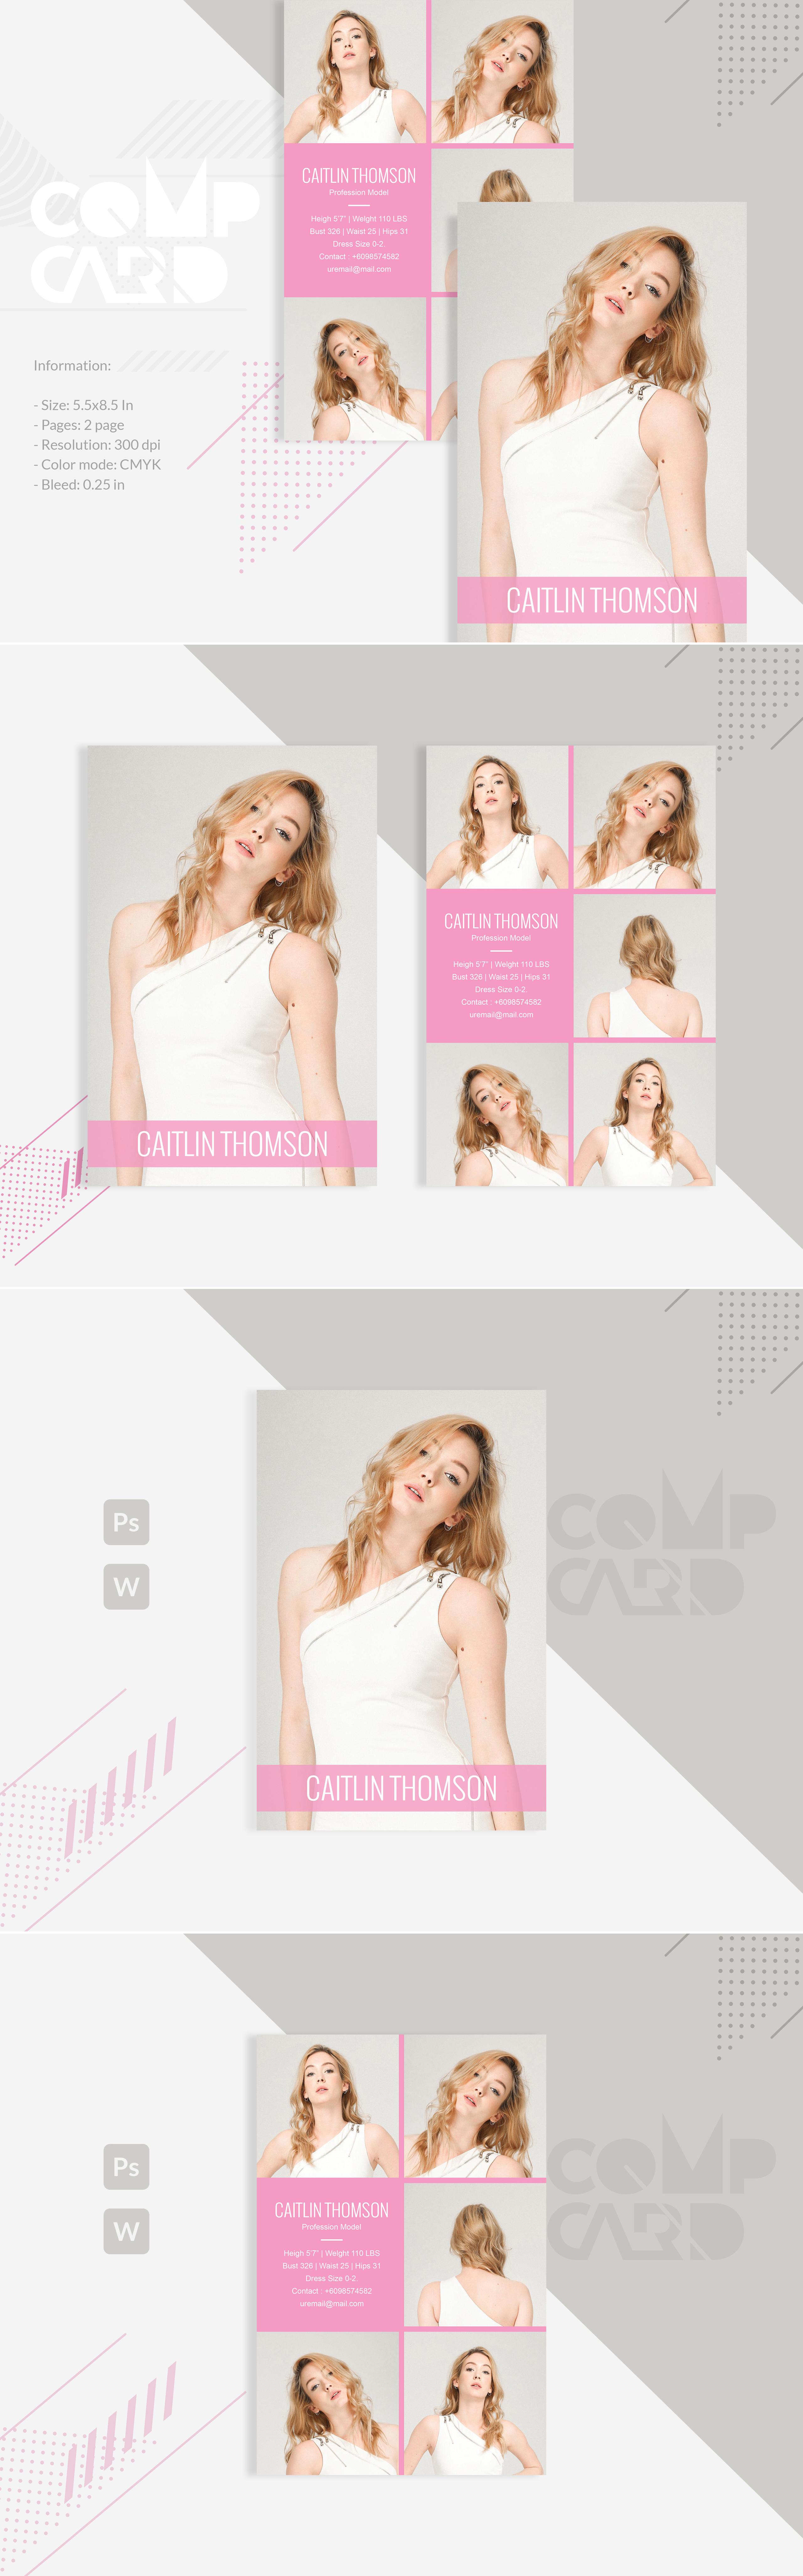 Caitlin Thomson Corporate Identity